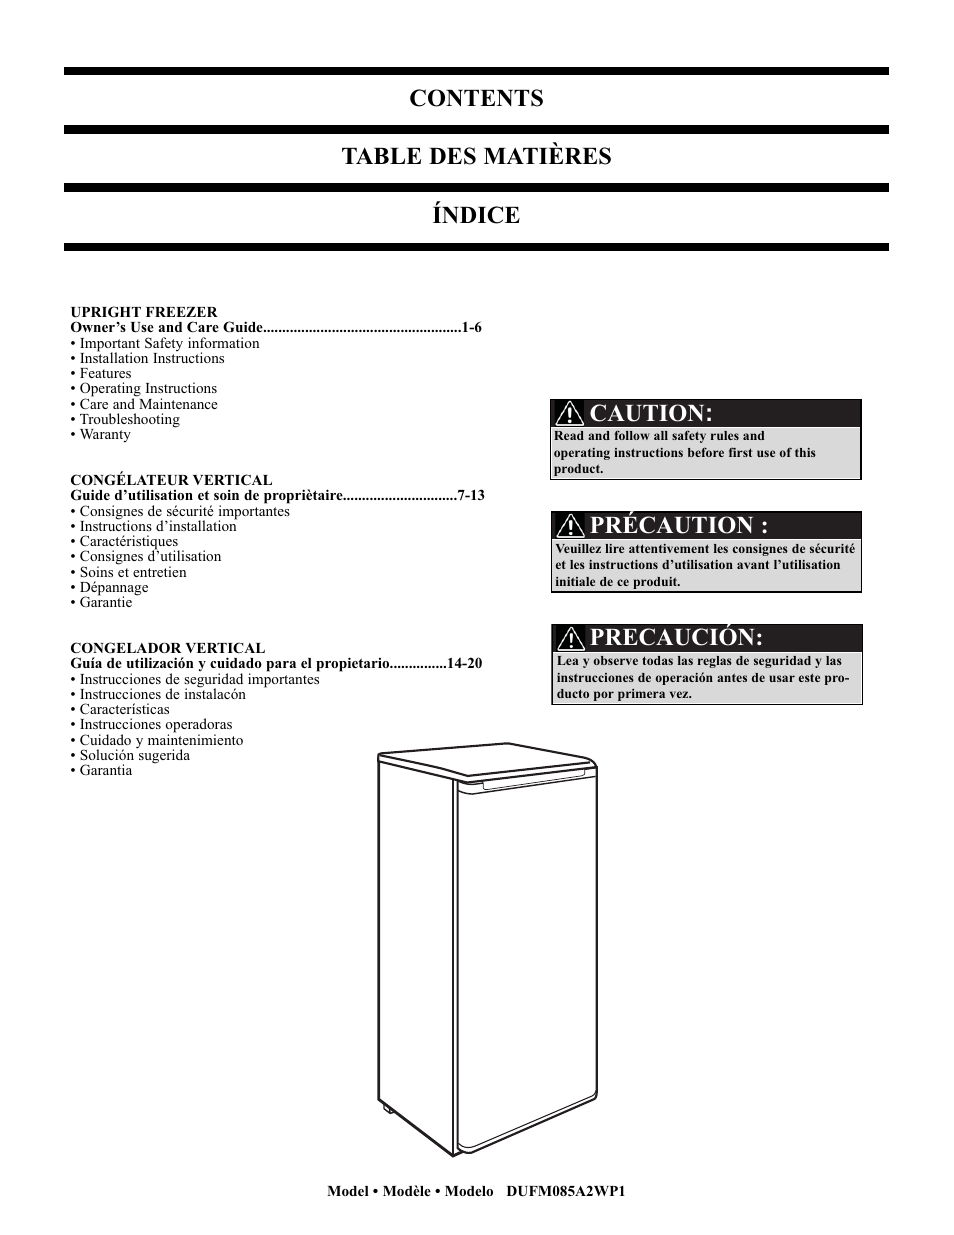 Danby dufm085a2wp1 user manual | page 23 / 23 | original mode.